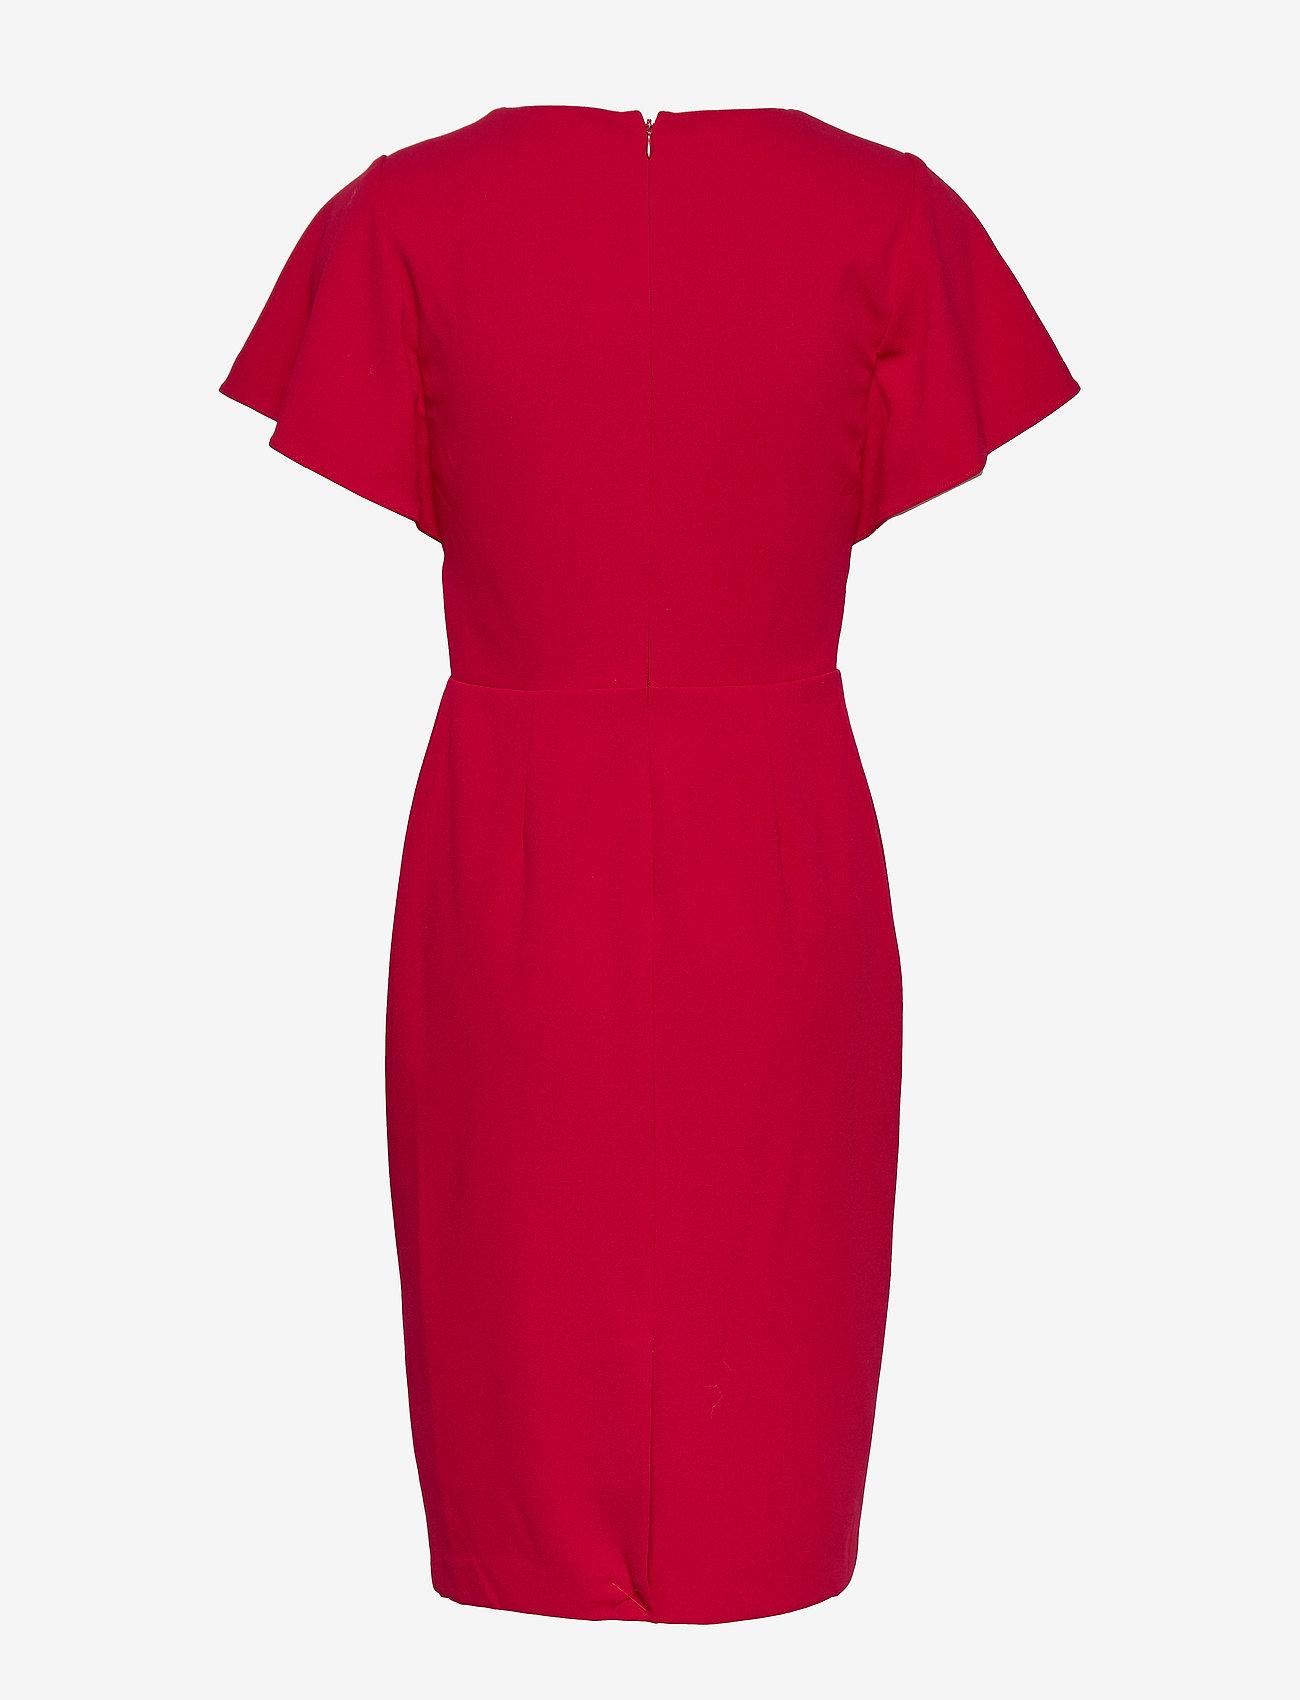 Lauren Ralph Lauren LUXE TECH CREPE-DRESS - Sukienki SCARLET RED - Kobiety Odzież.